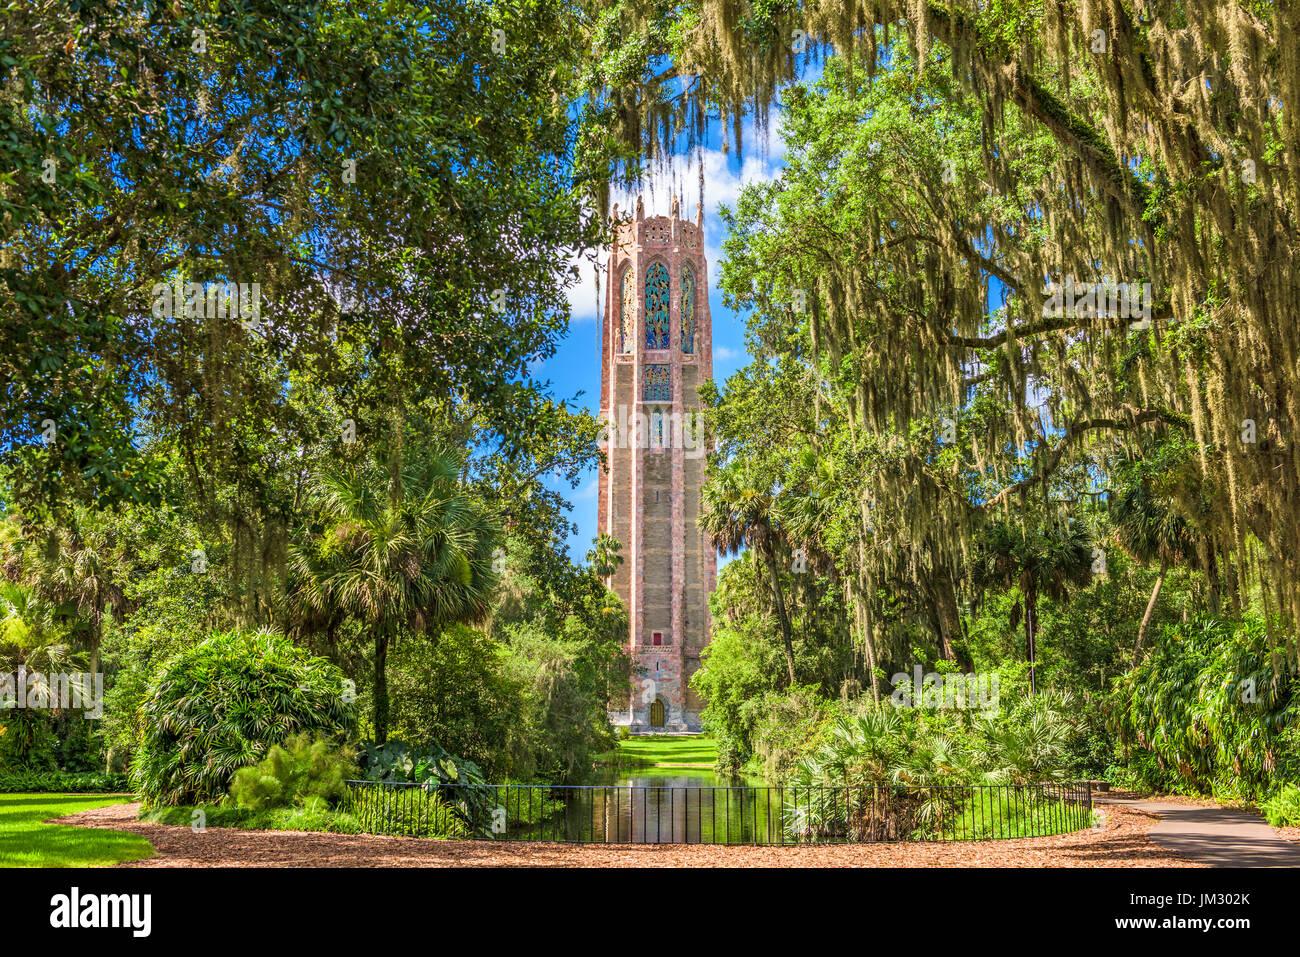 Lake Wales, Florida, USA at Bok Tower Gardens. - Stock Image